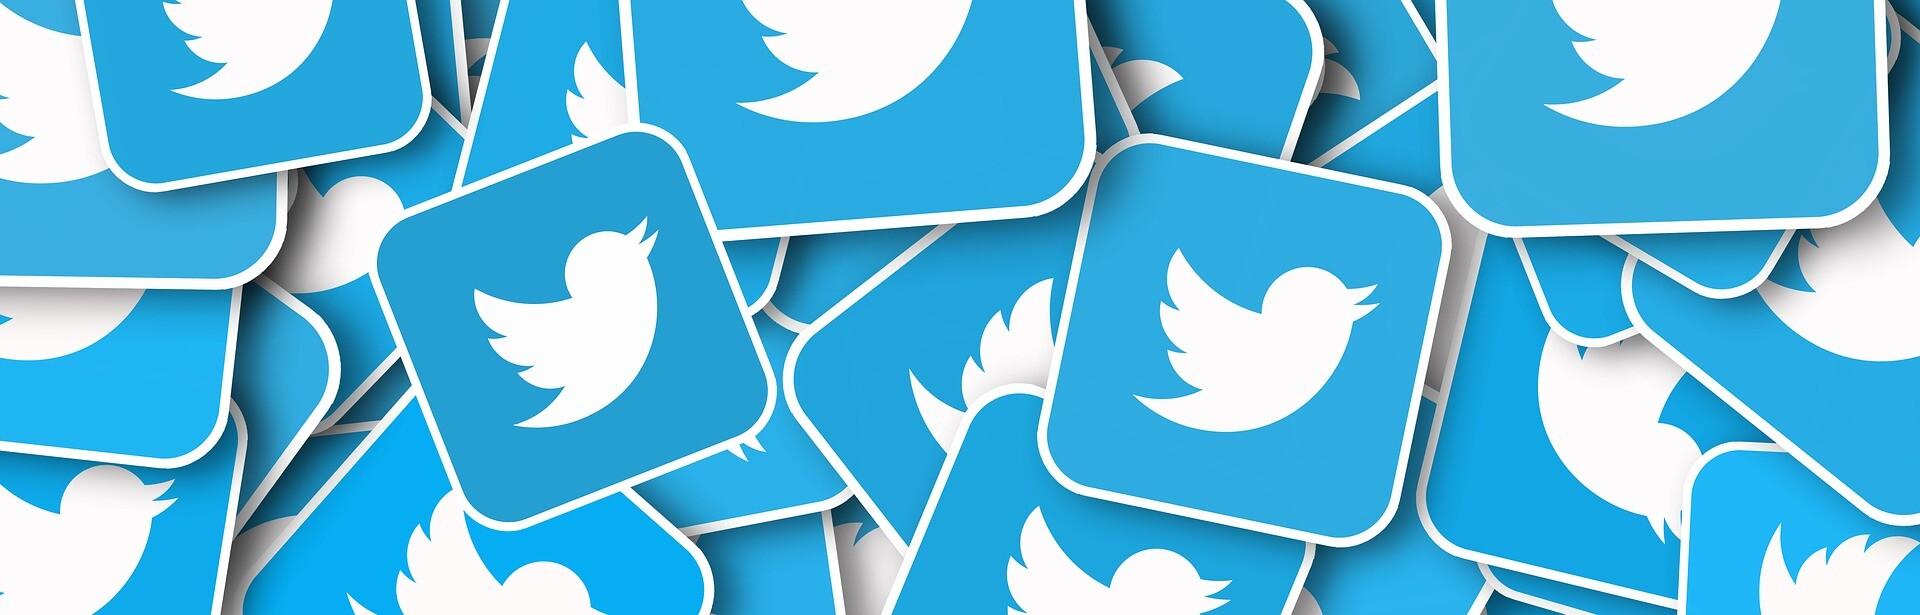 verificacion twitter